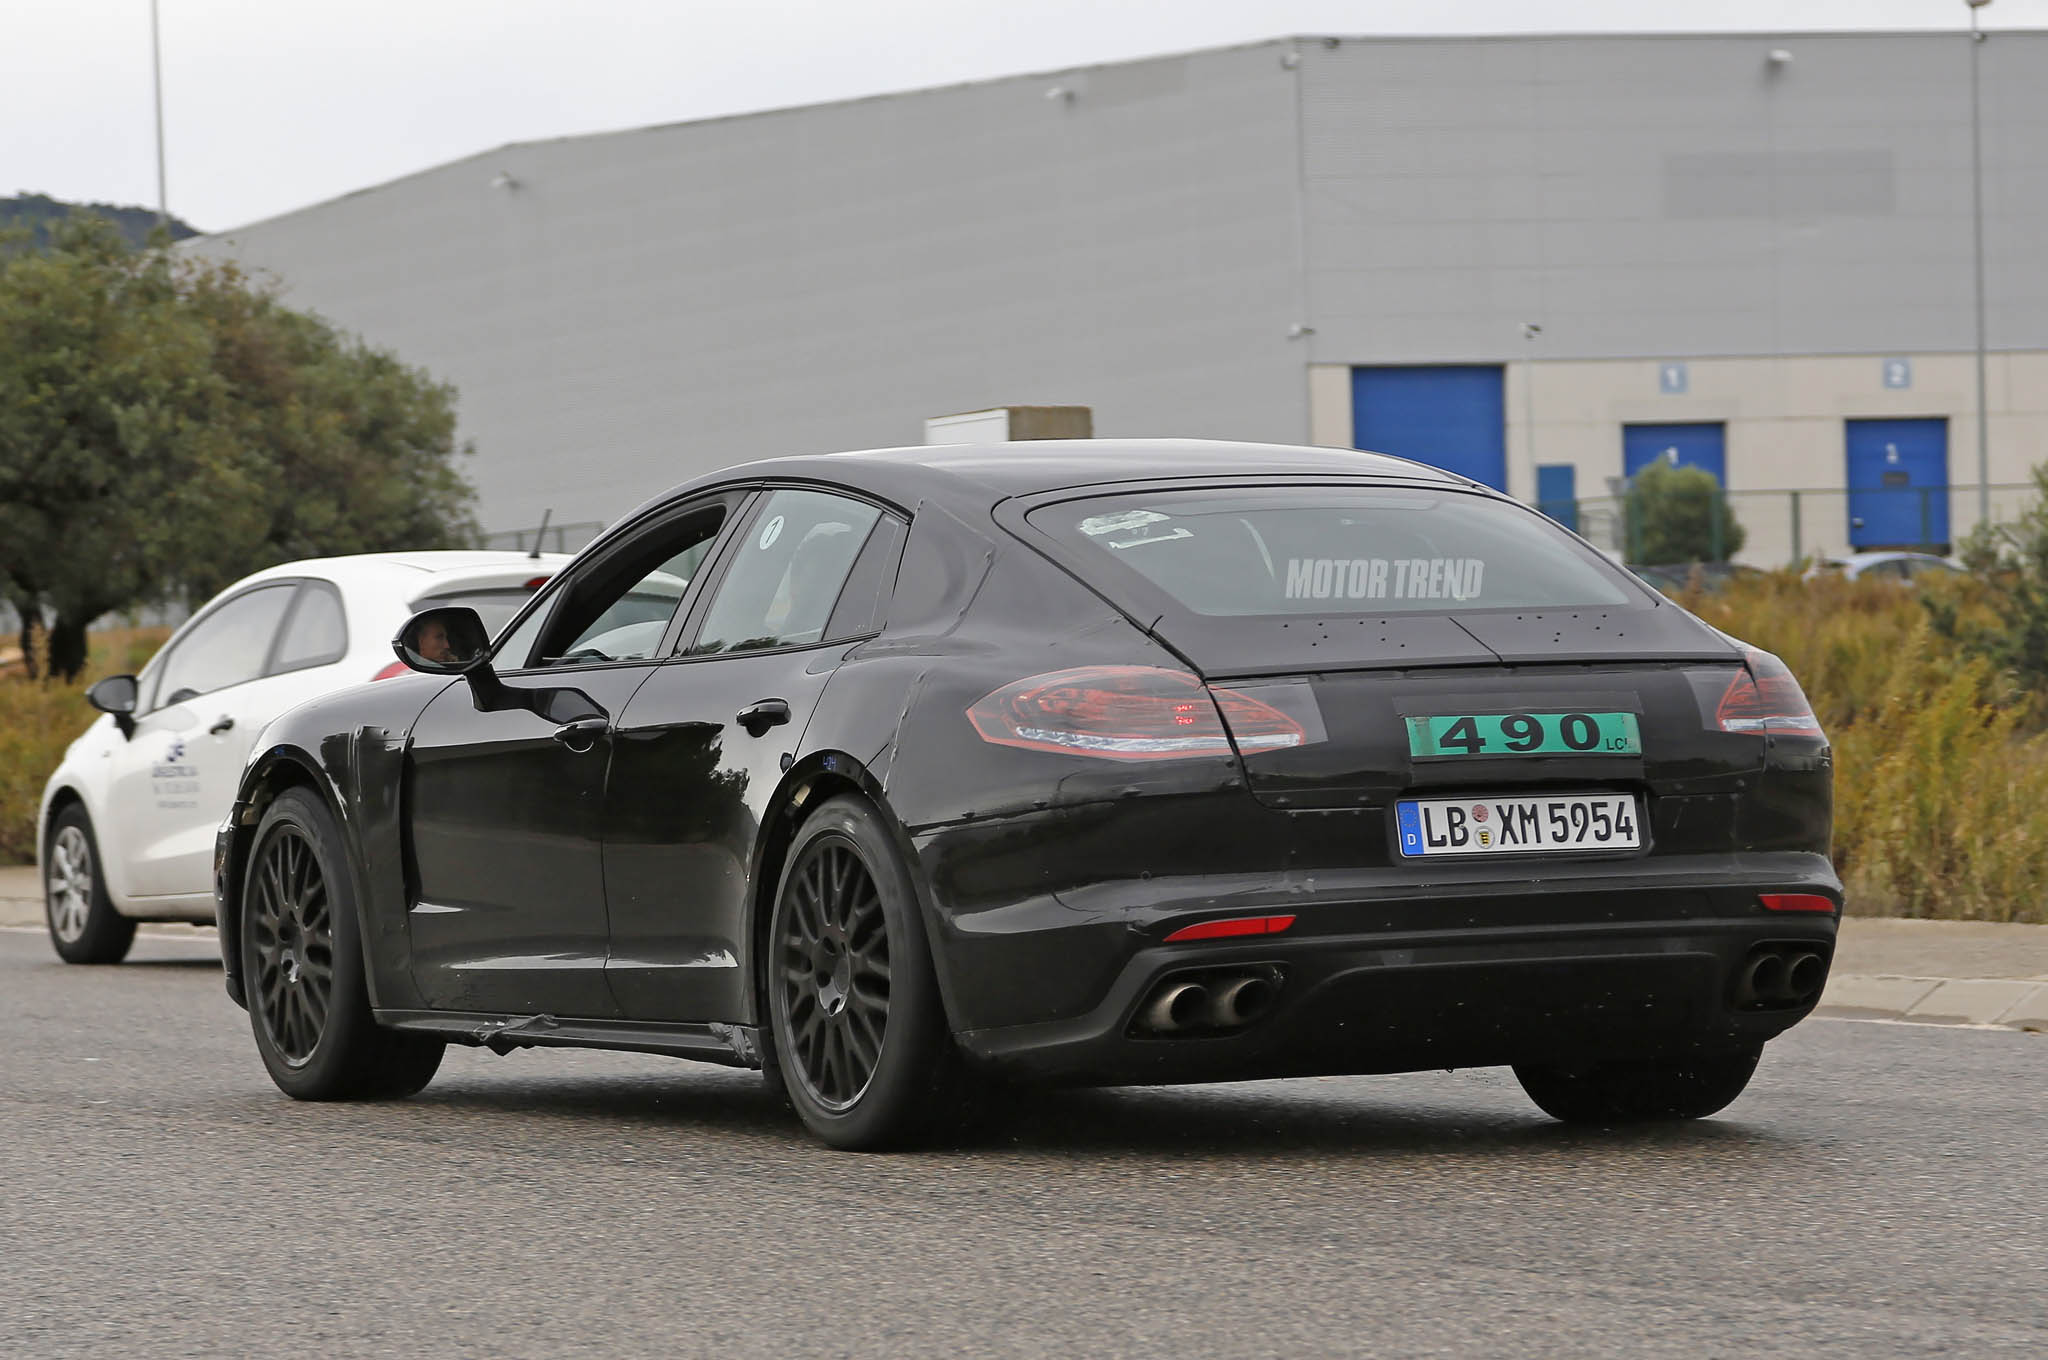 Next Gen Porsche Panamera Rear View